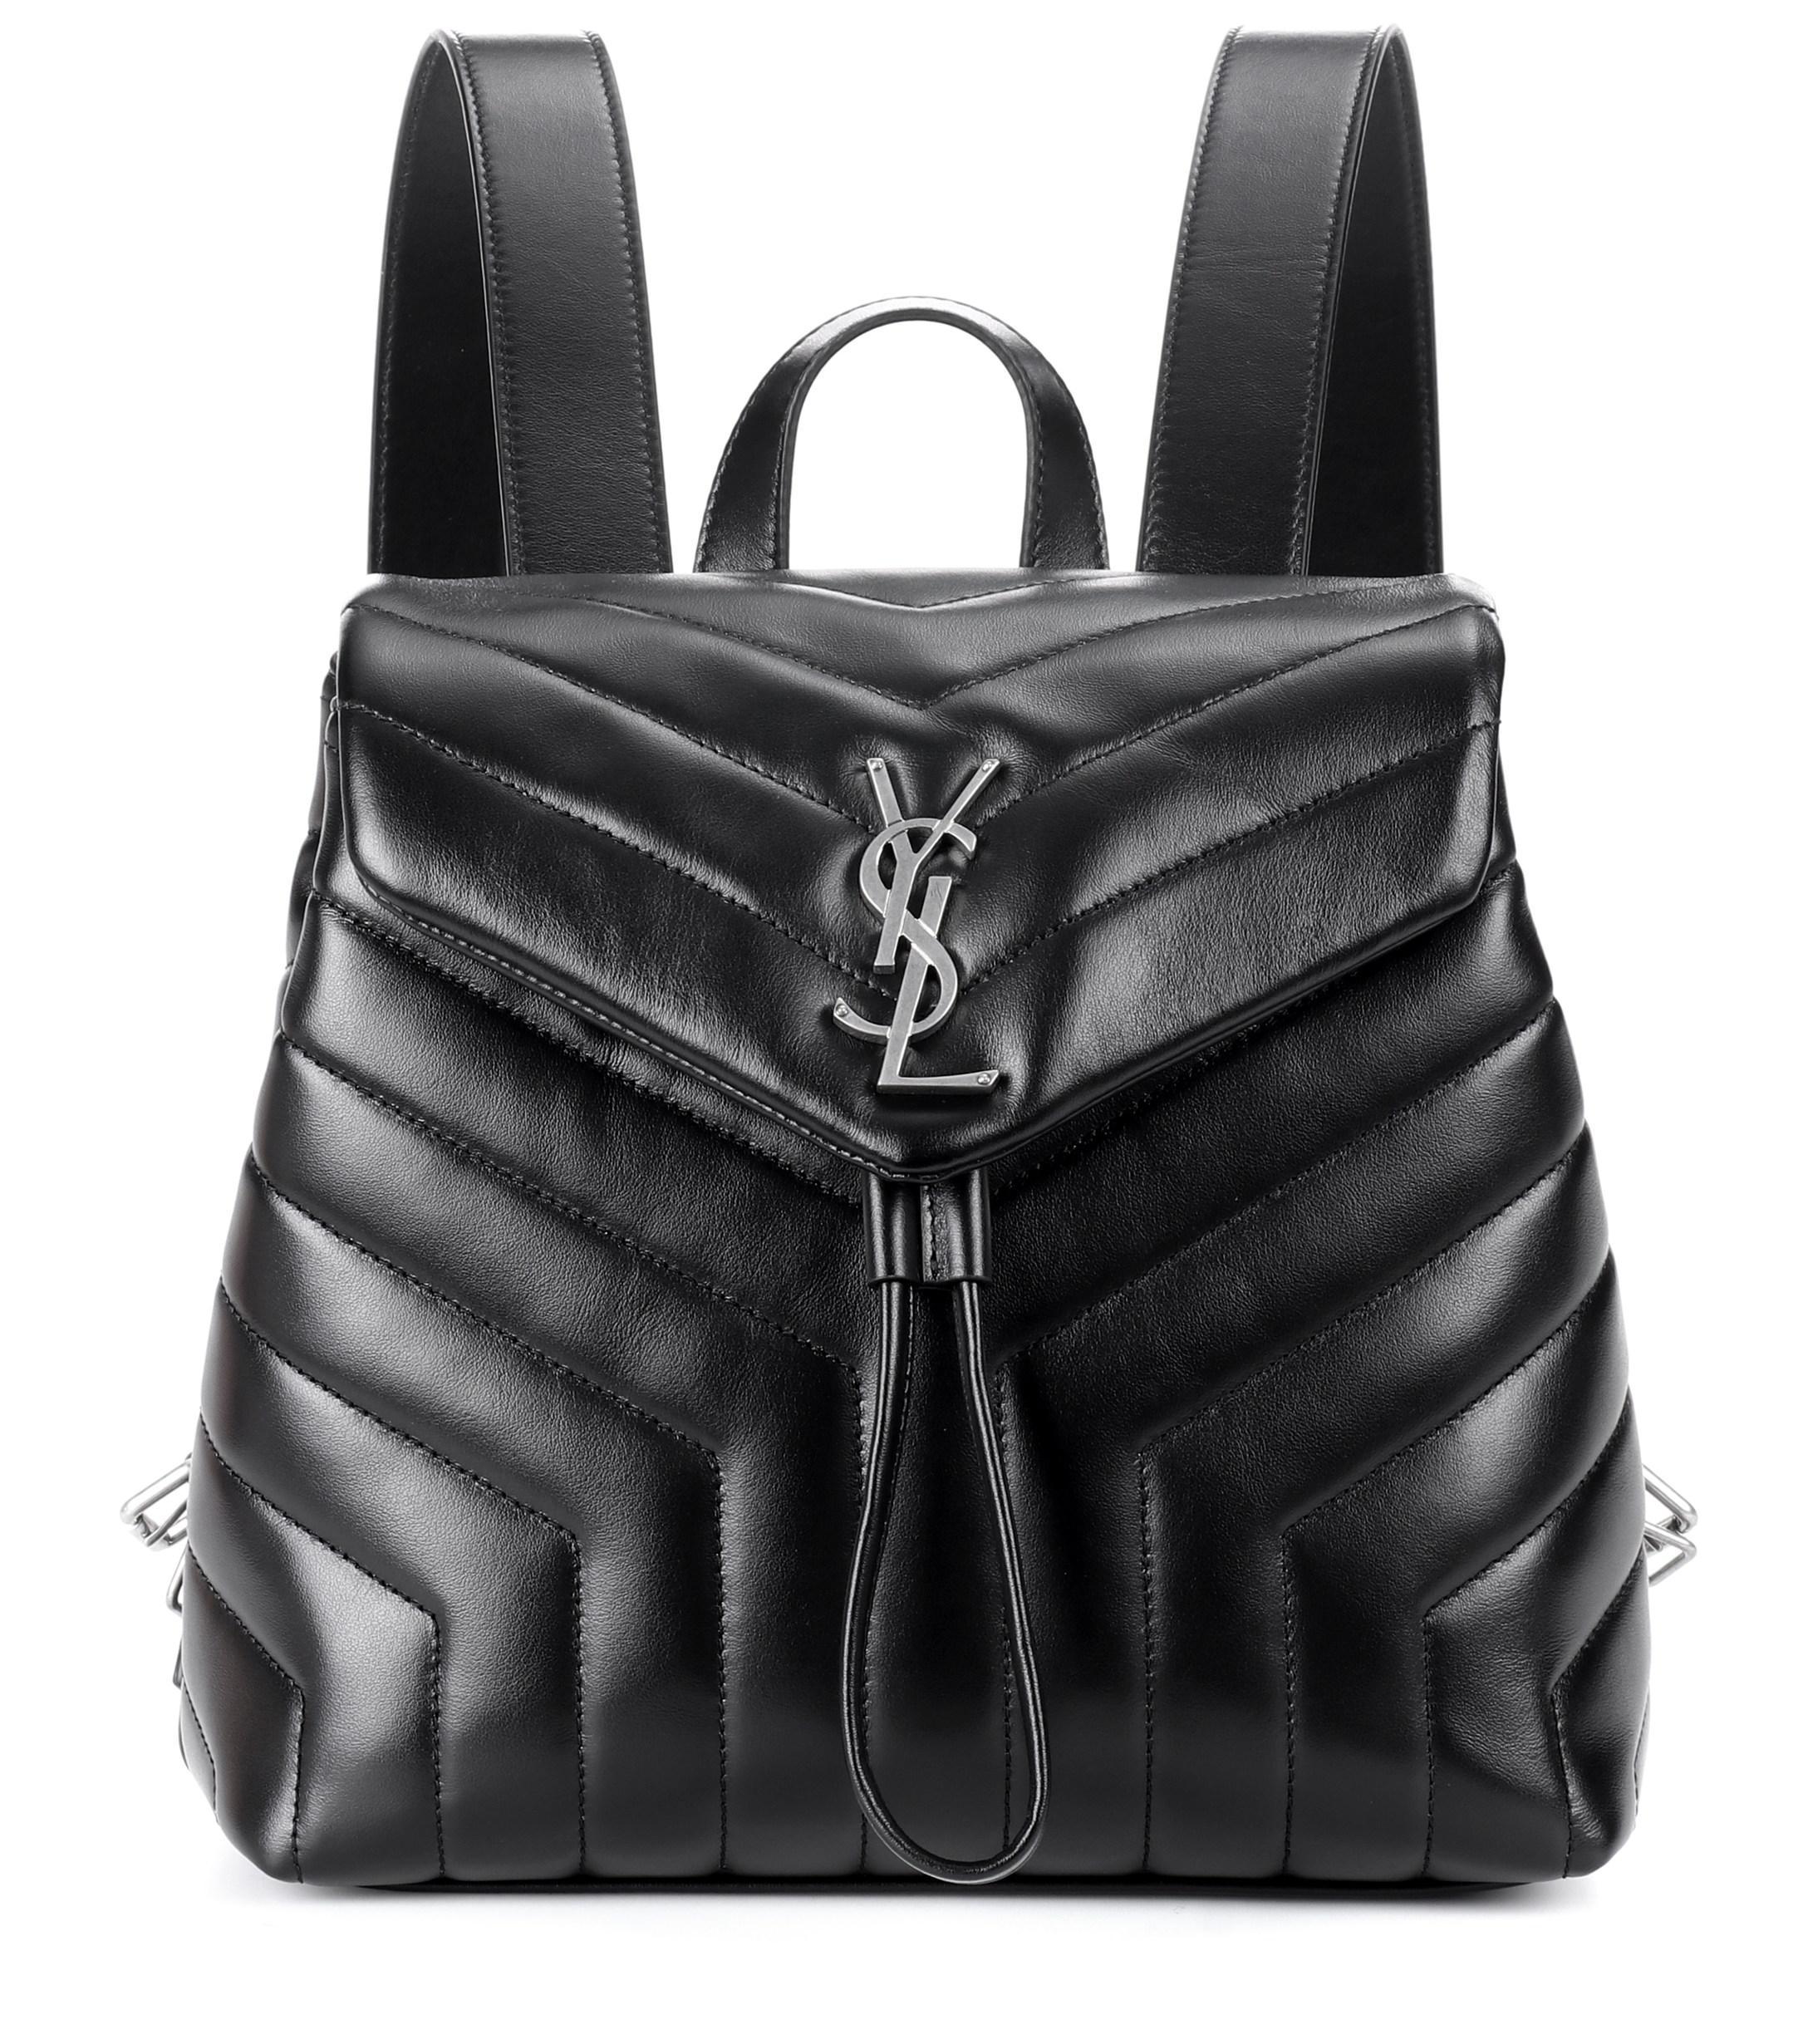 9c7a42d4ec63 Lyst - Saint Laurent Small Loulou Monogram Backpack in Black